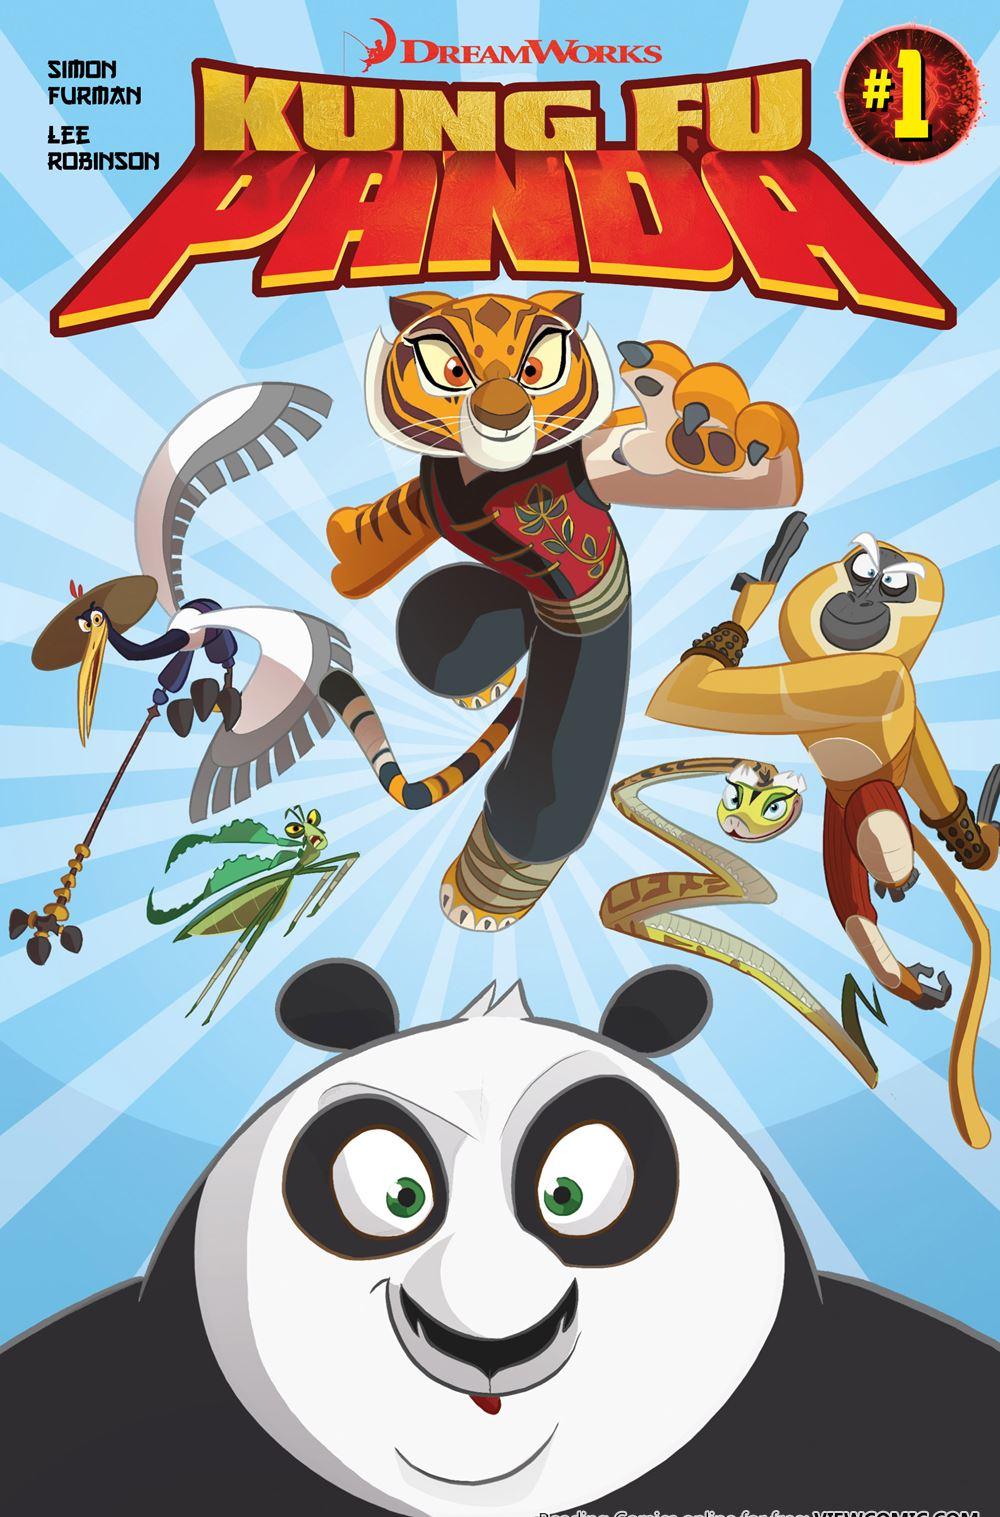 Kung Fu Panda 001 2015 | Read Kung Fu Panda 001 2015 comic